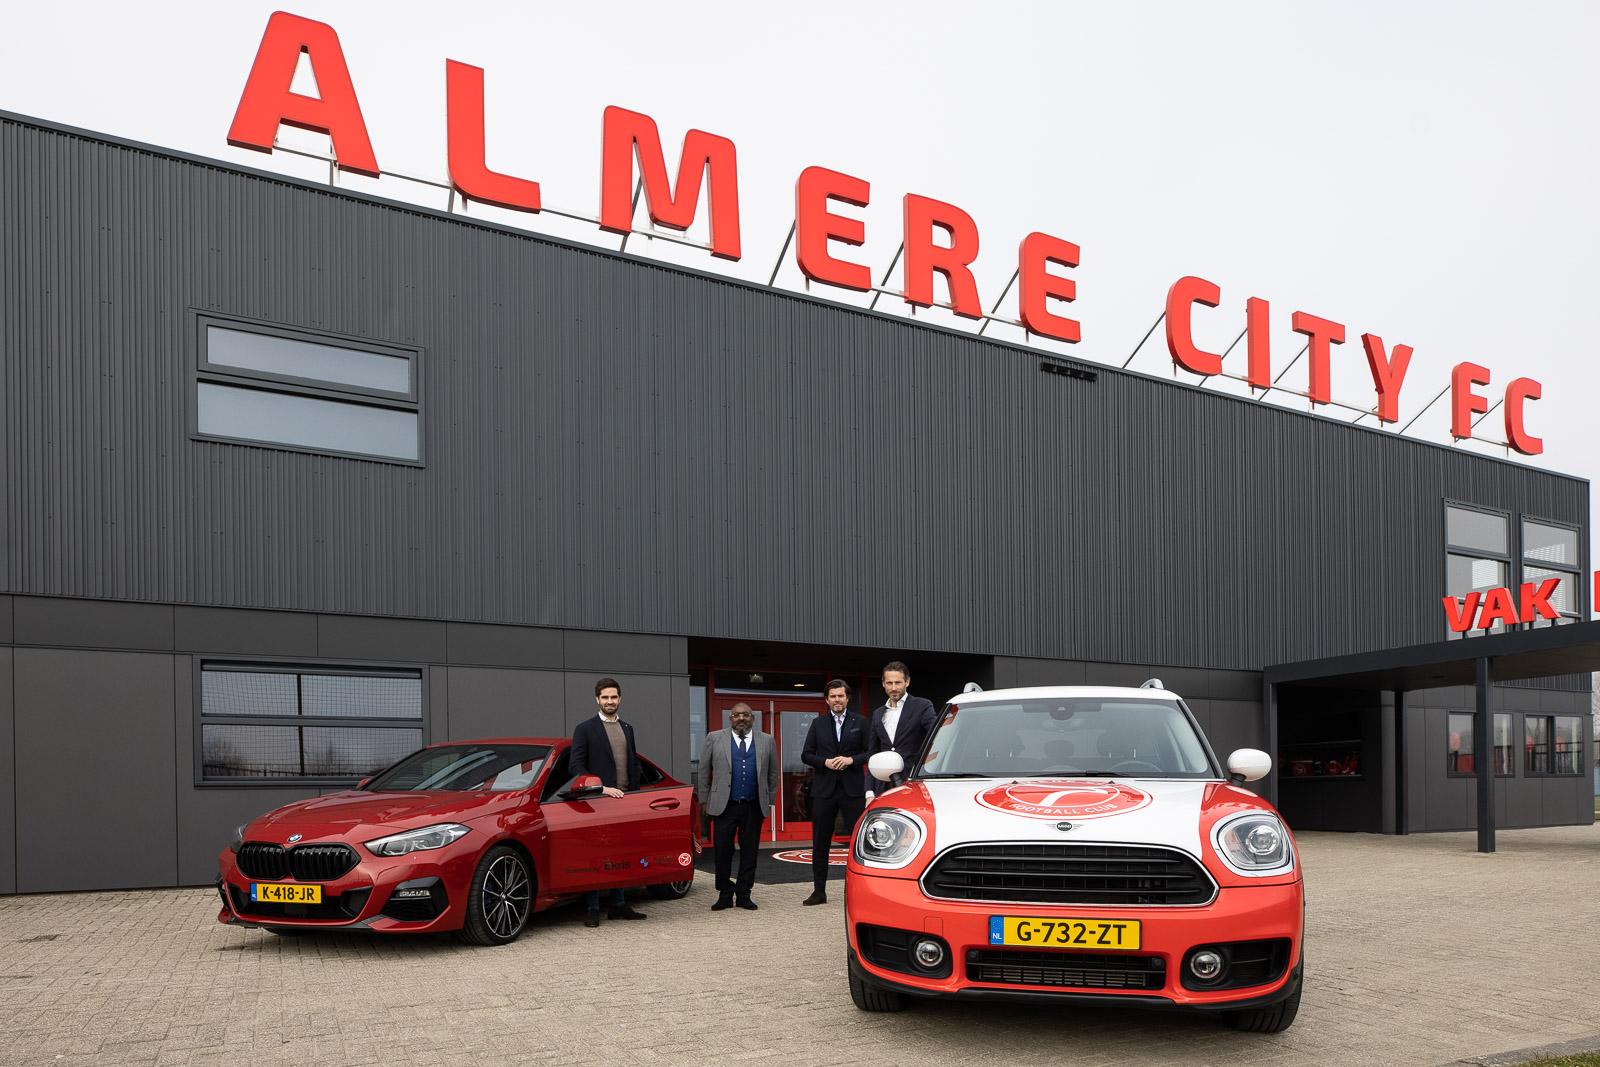 Ekris ook komende seizoen mobiliteitspartner Almere City FC